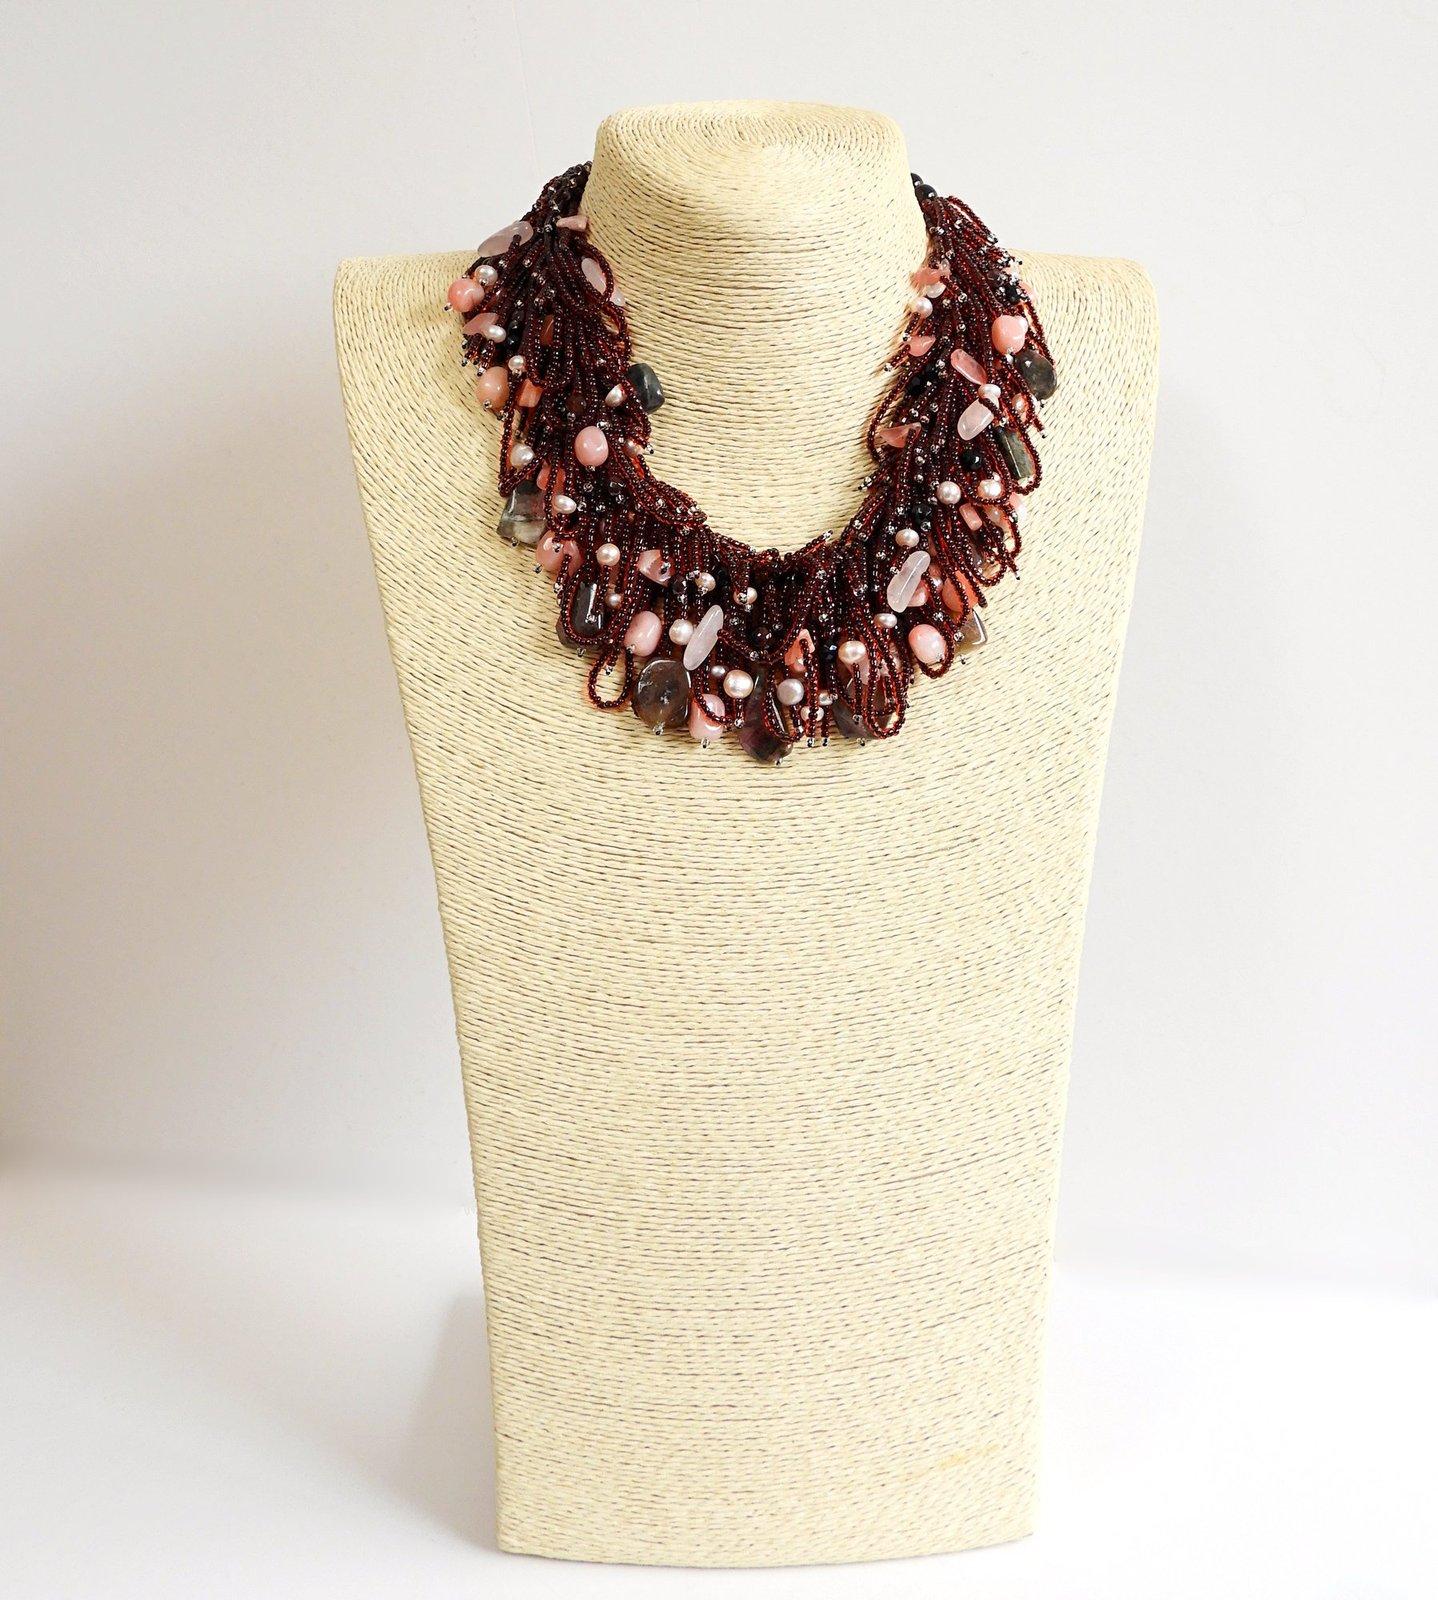 Tourmaline, Pink Opal, Rose Quartz and Garnet Necklace with Mauve Pearls